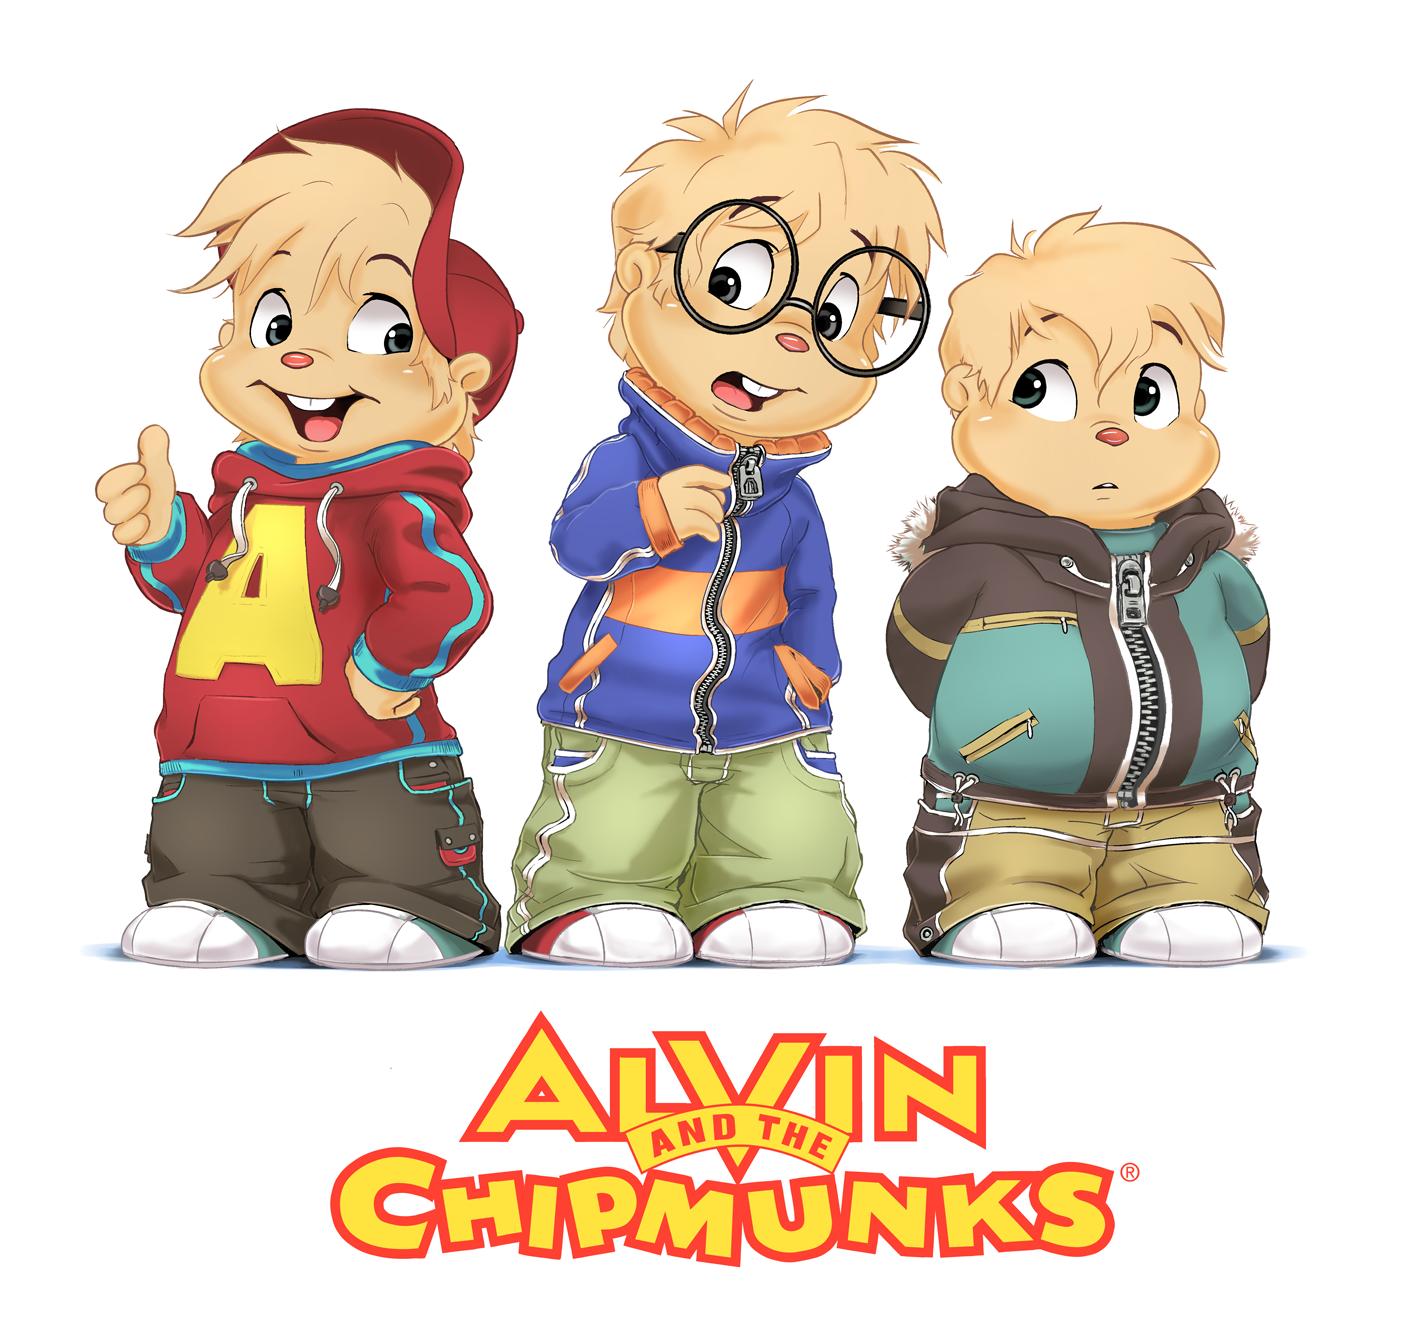 Cold Weather Chipmunks By Duiker On Deviantart Chipmunks Alvin And The Chipmunks Cartoon